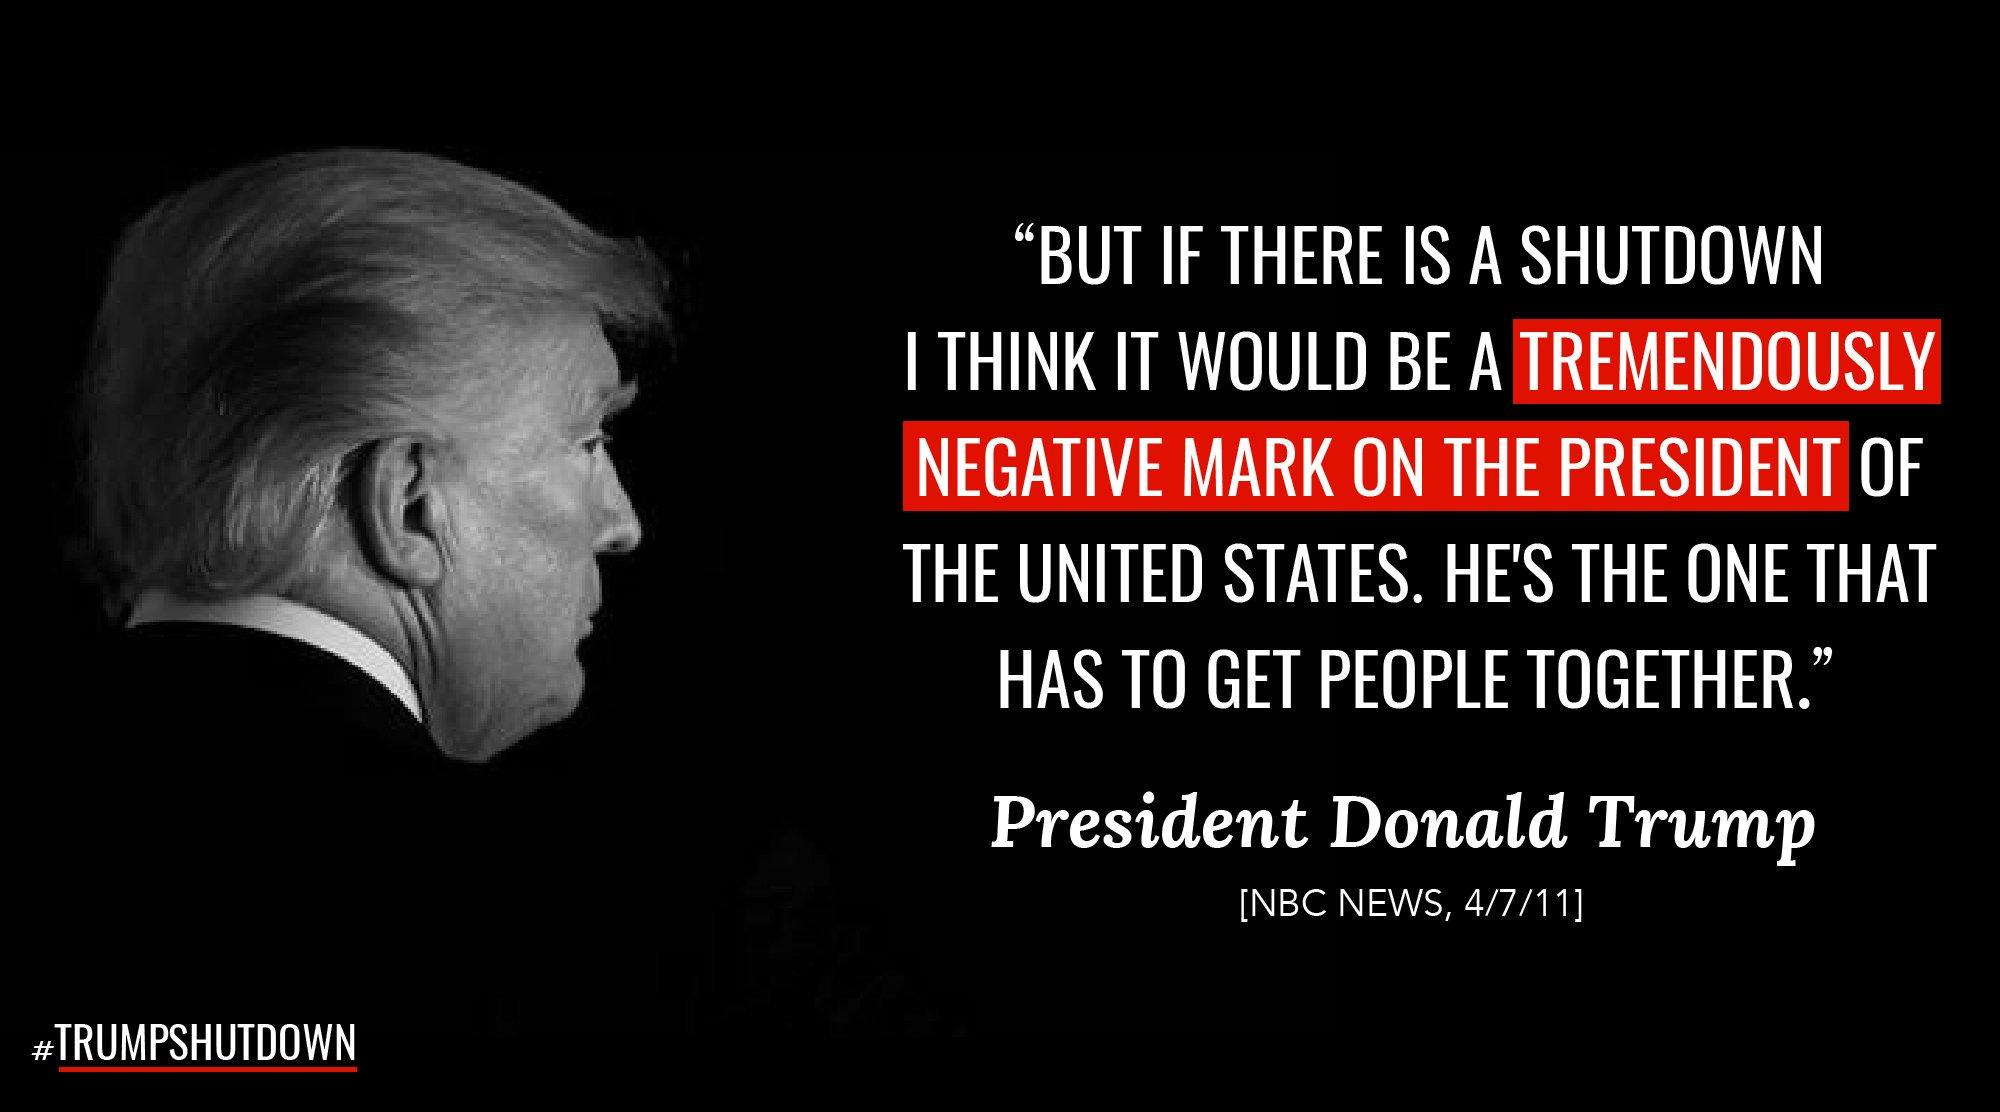 @realDonaldTrump  https://t.co/H2iF4EffJc